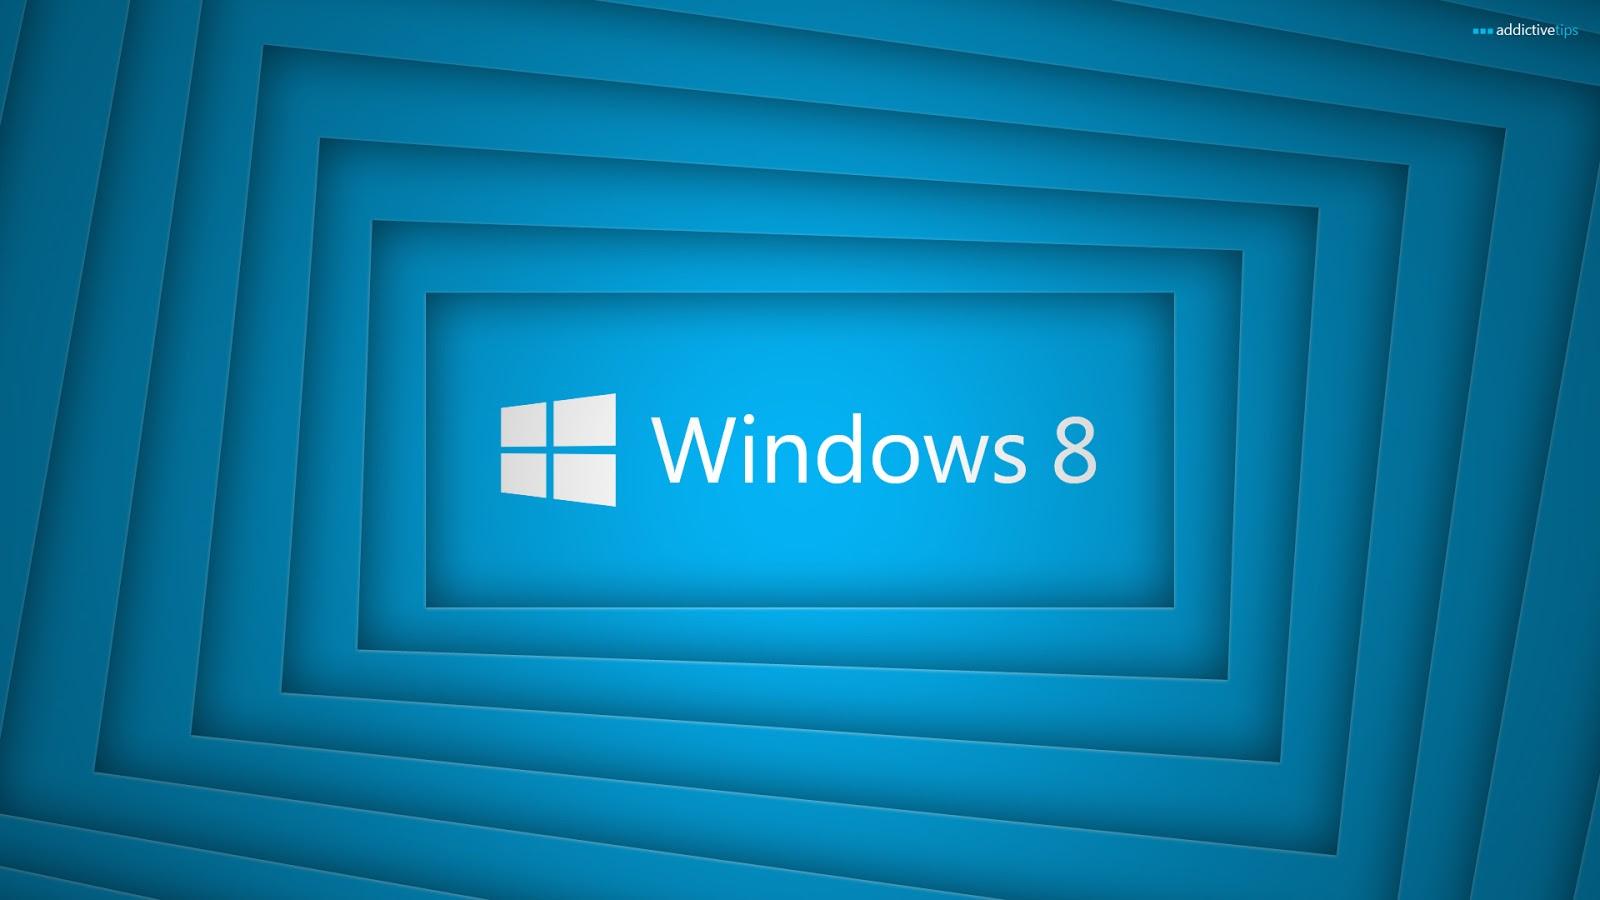 http://4.bp.blogspot.com/-Clx6w3iA4wo/UJUUFSpljcI/AAAAAAAAHkw/aSxUhiT22eo/s1600/Windows+8+HD+wallpapers+Image00002.jpg